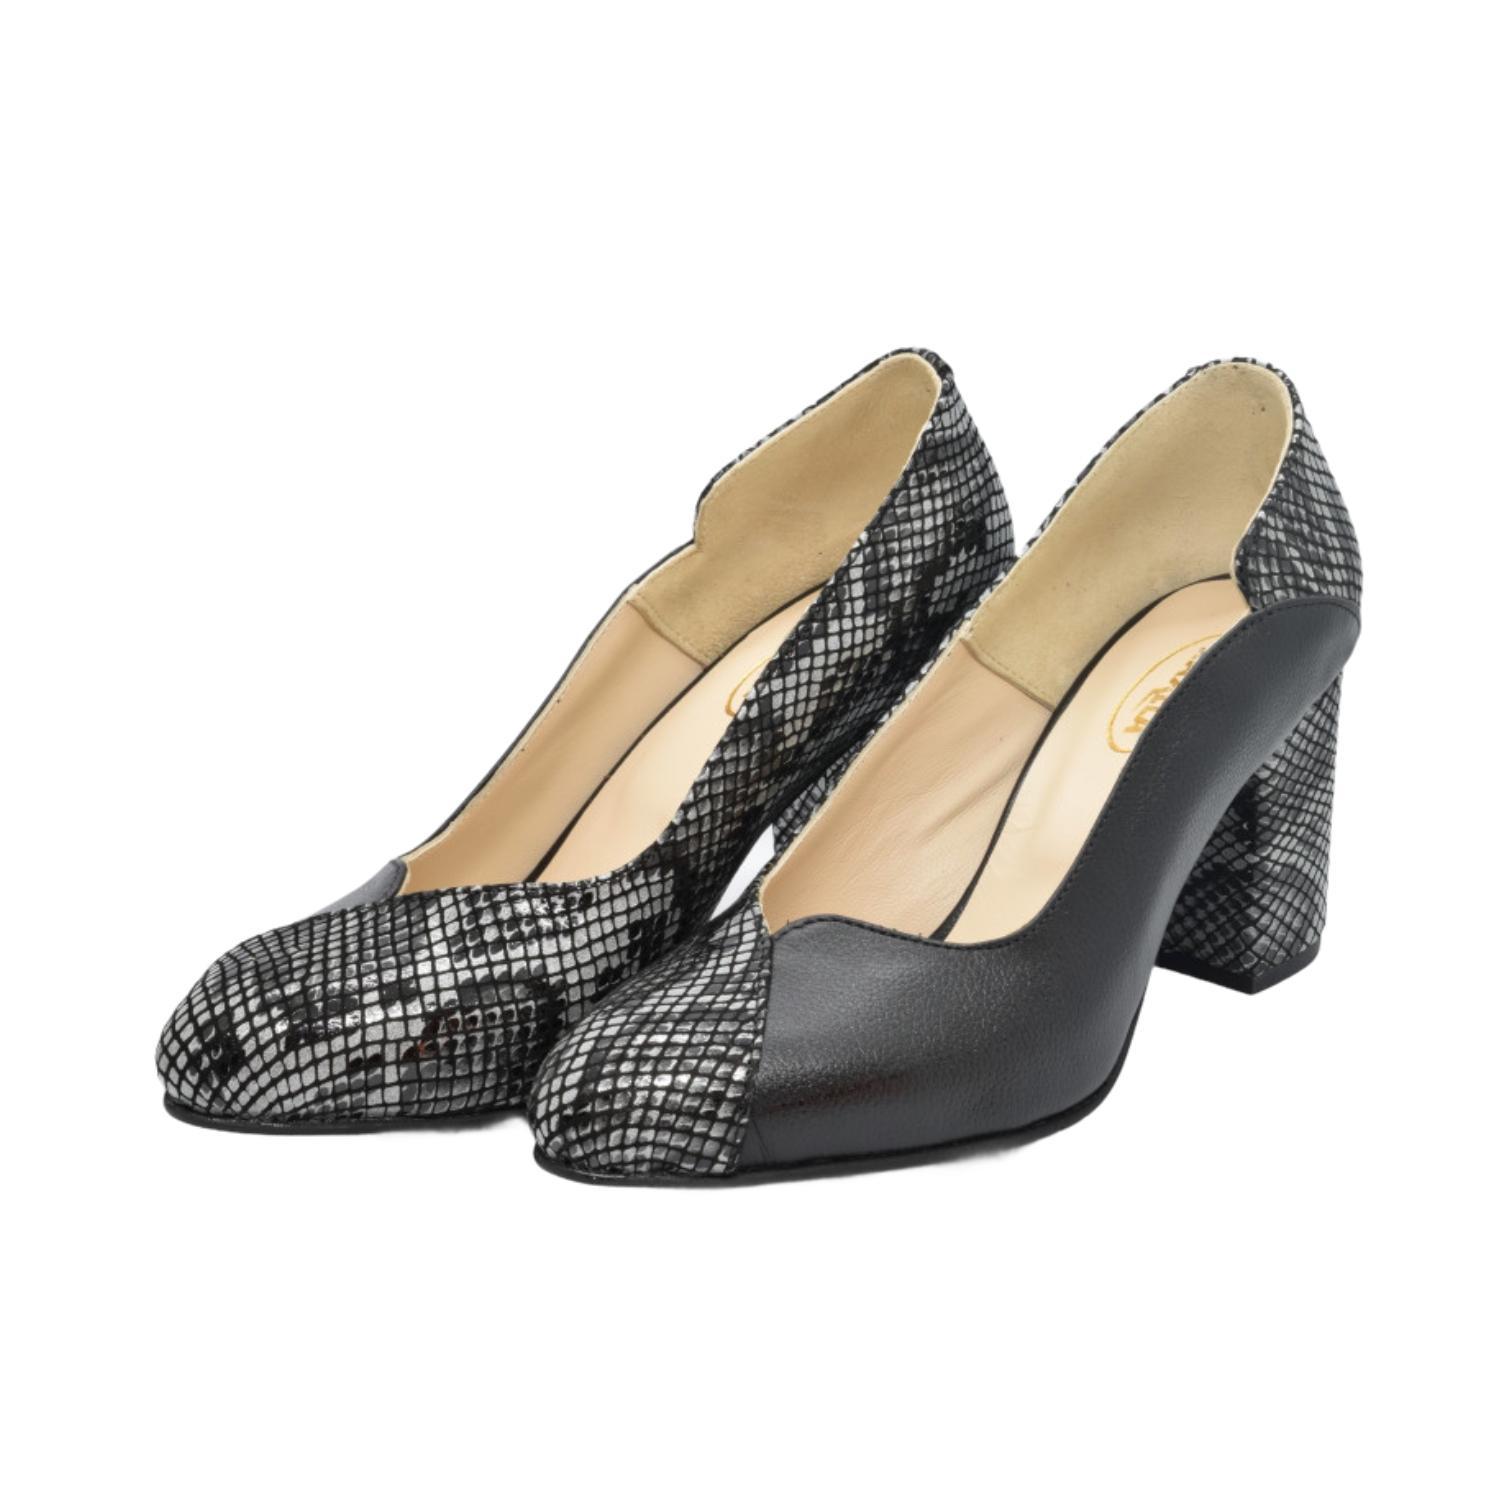 Pantofi negri cu model abstract tip sarpe